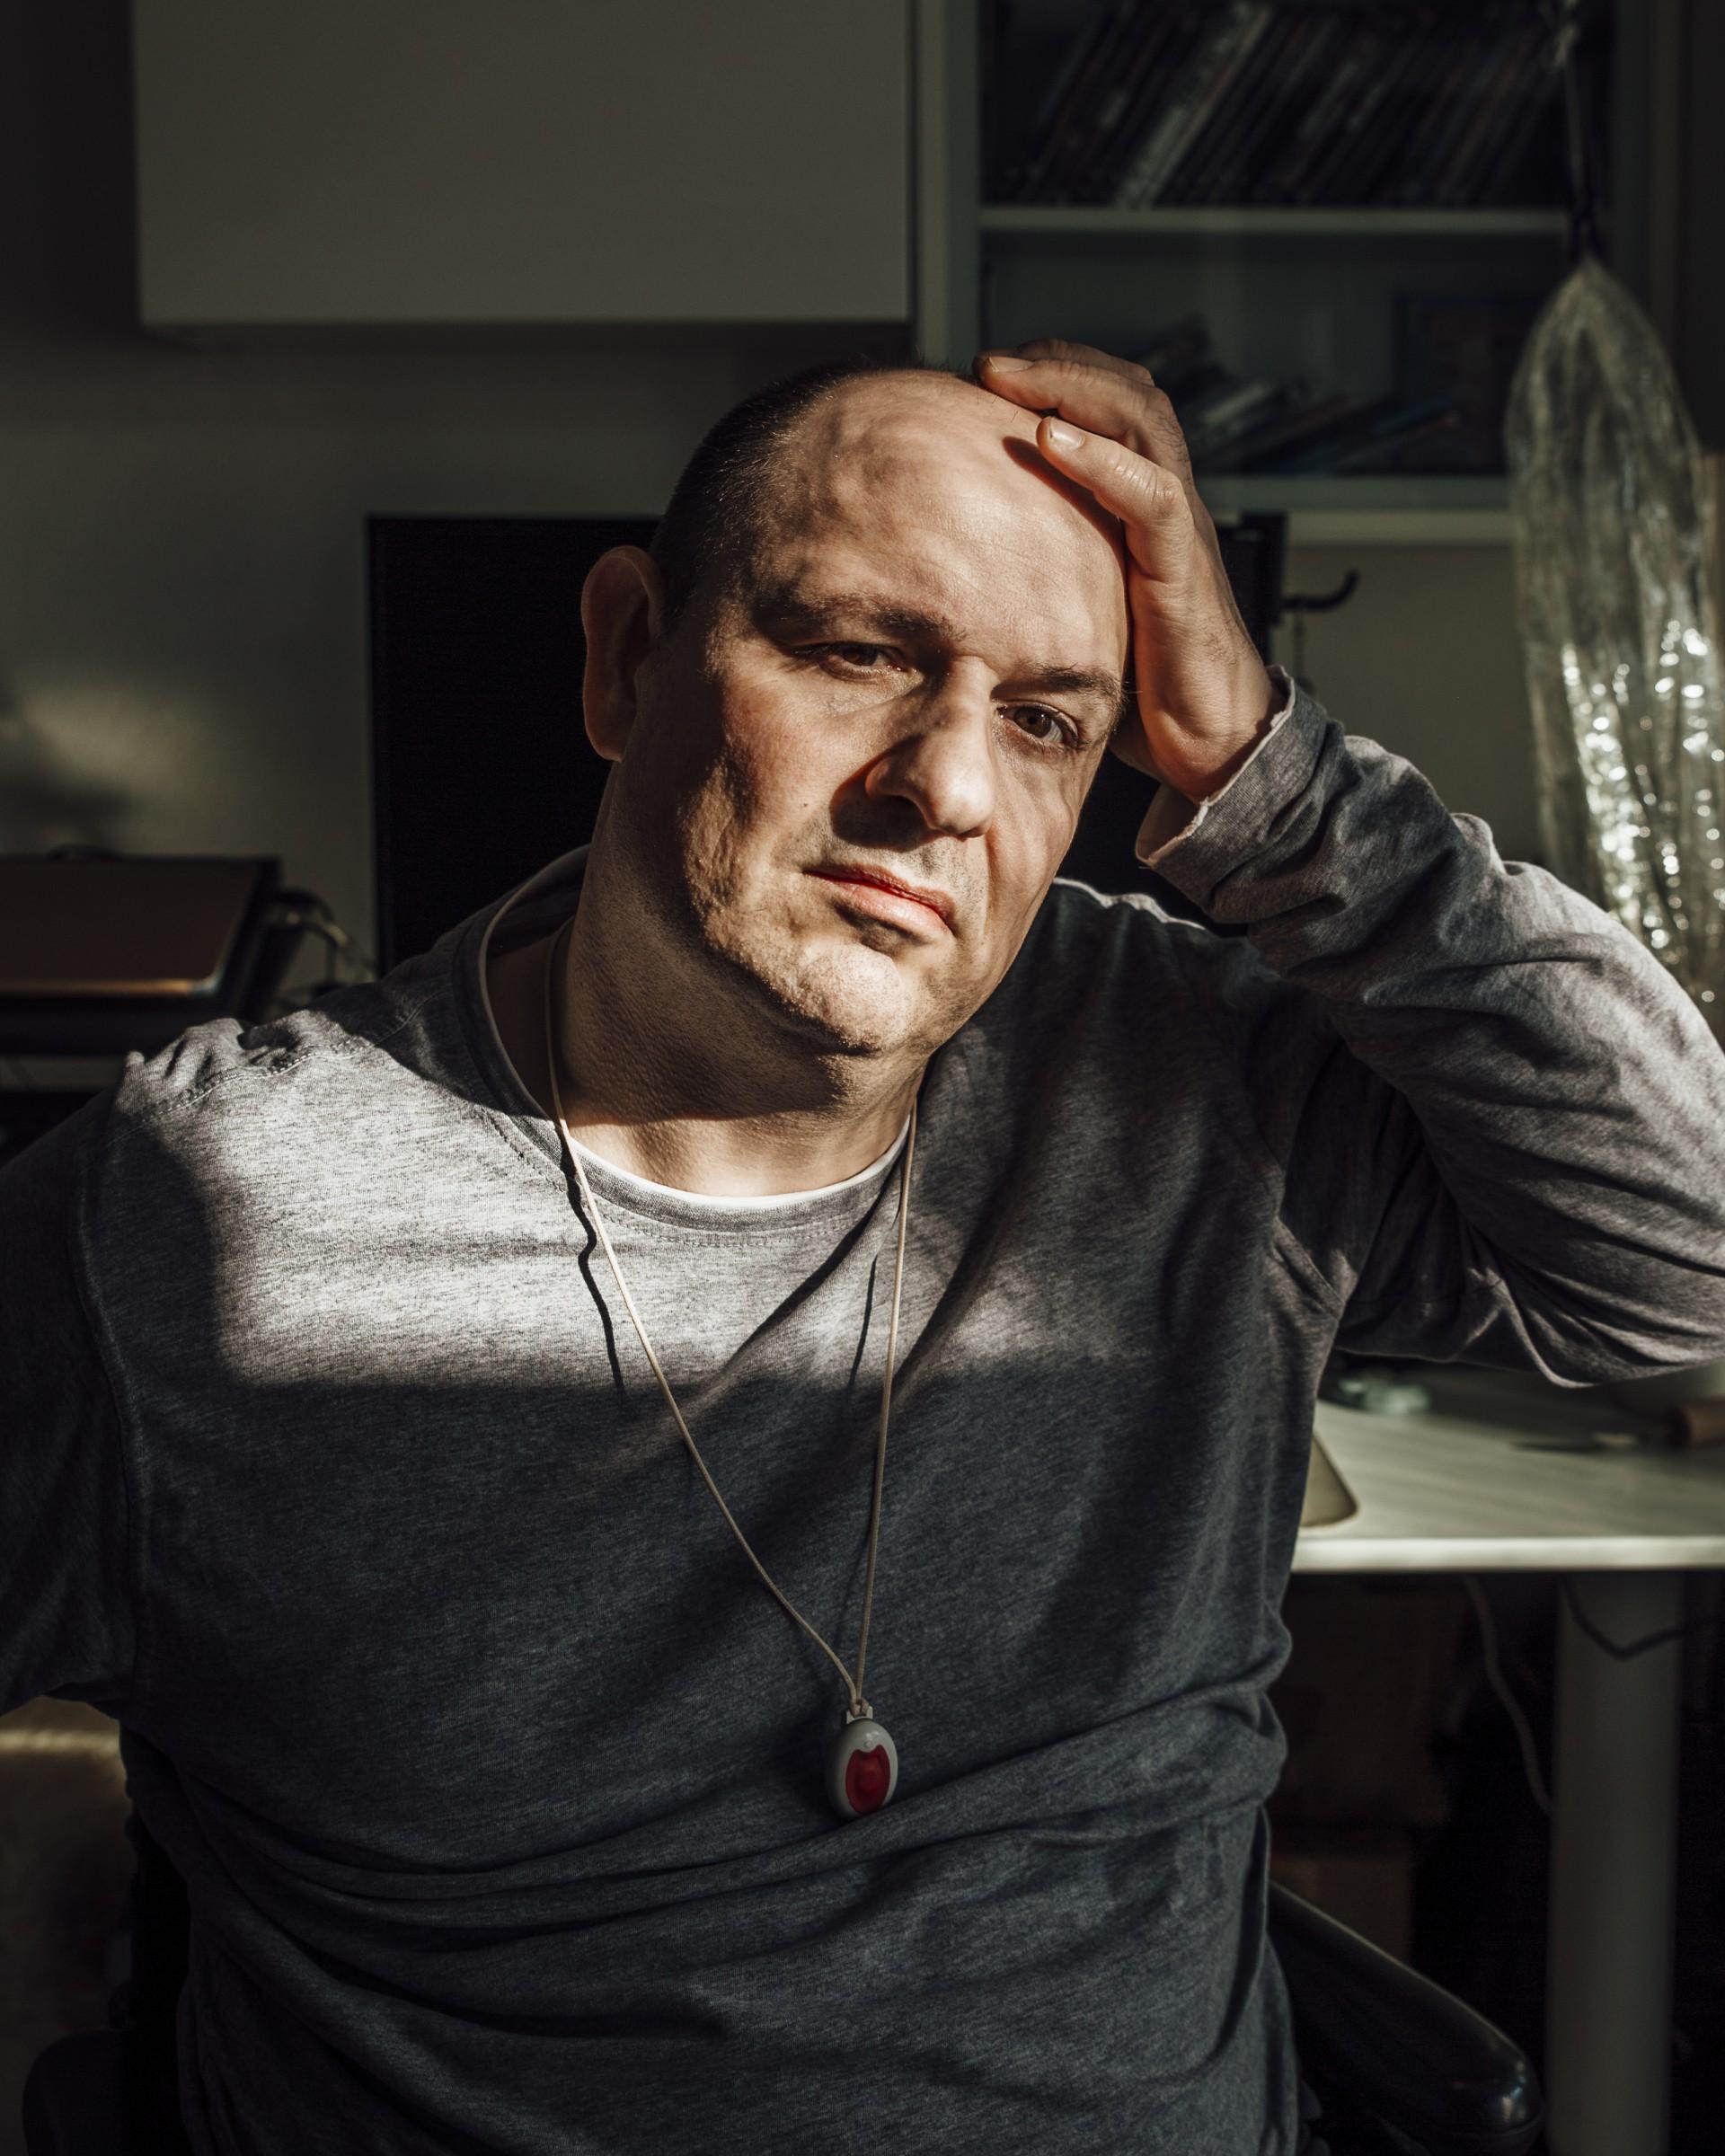 Marcel Maffei.com Victims of Justice – Die Zeit